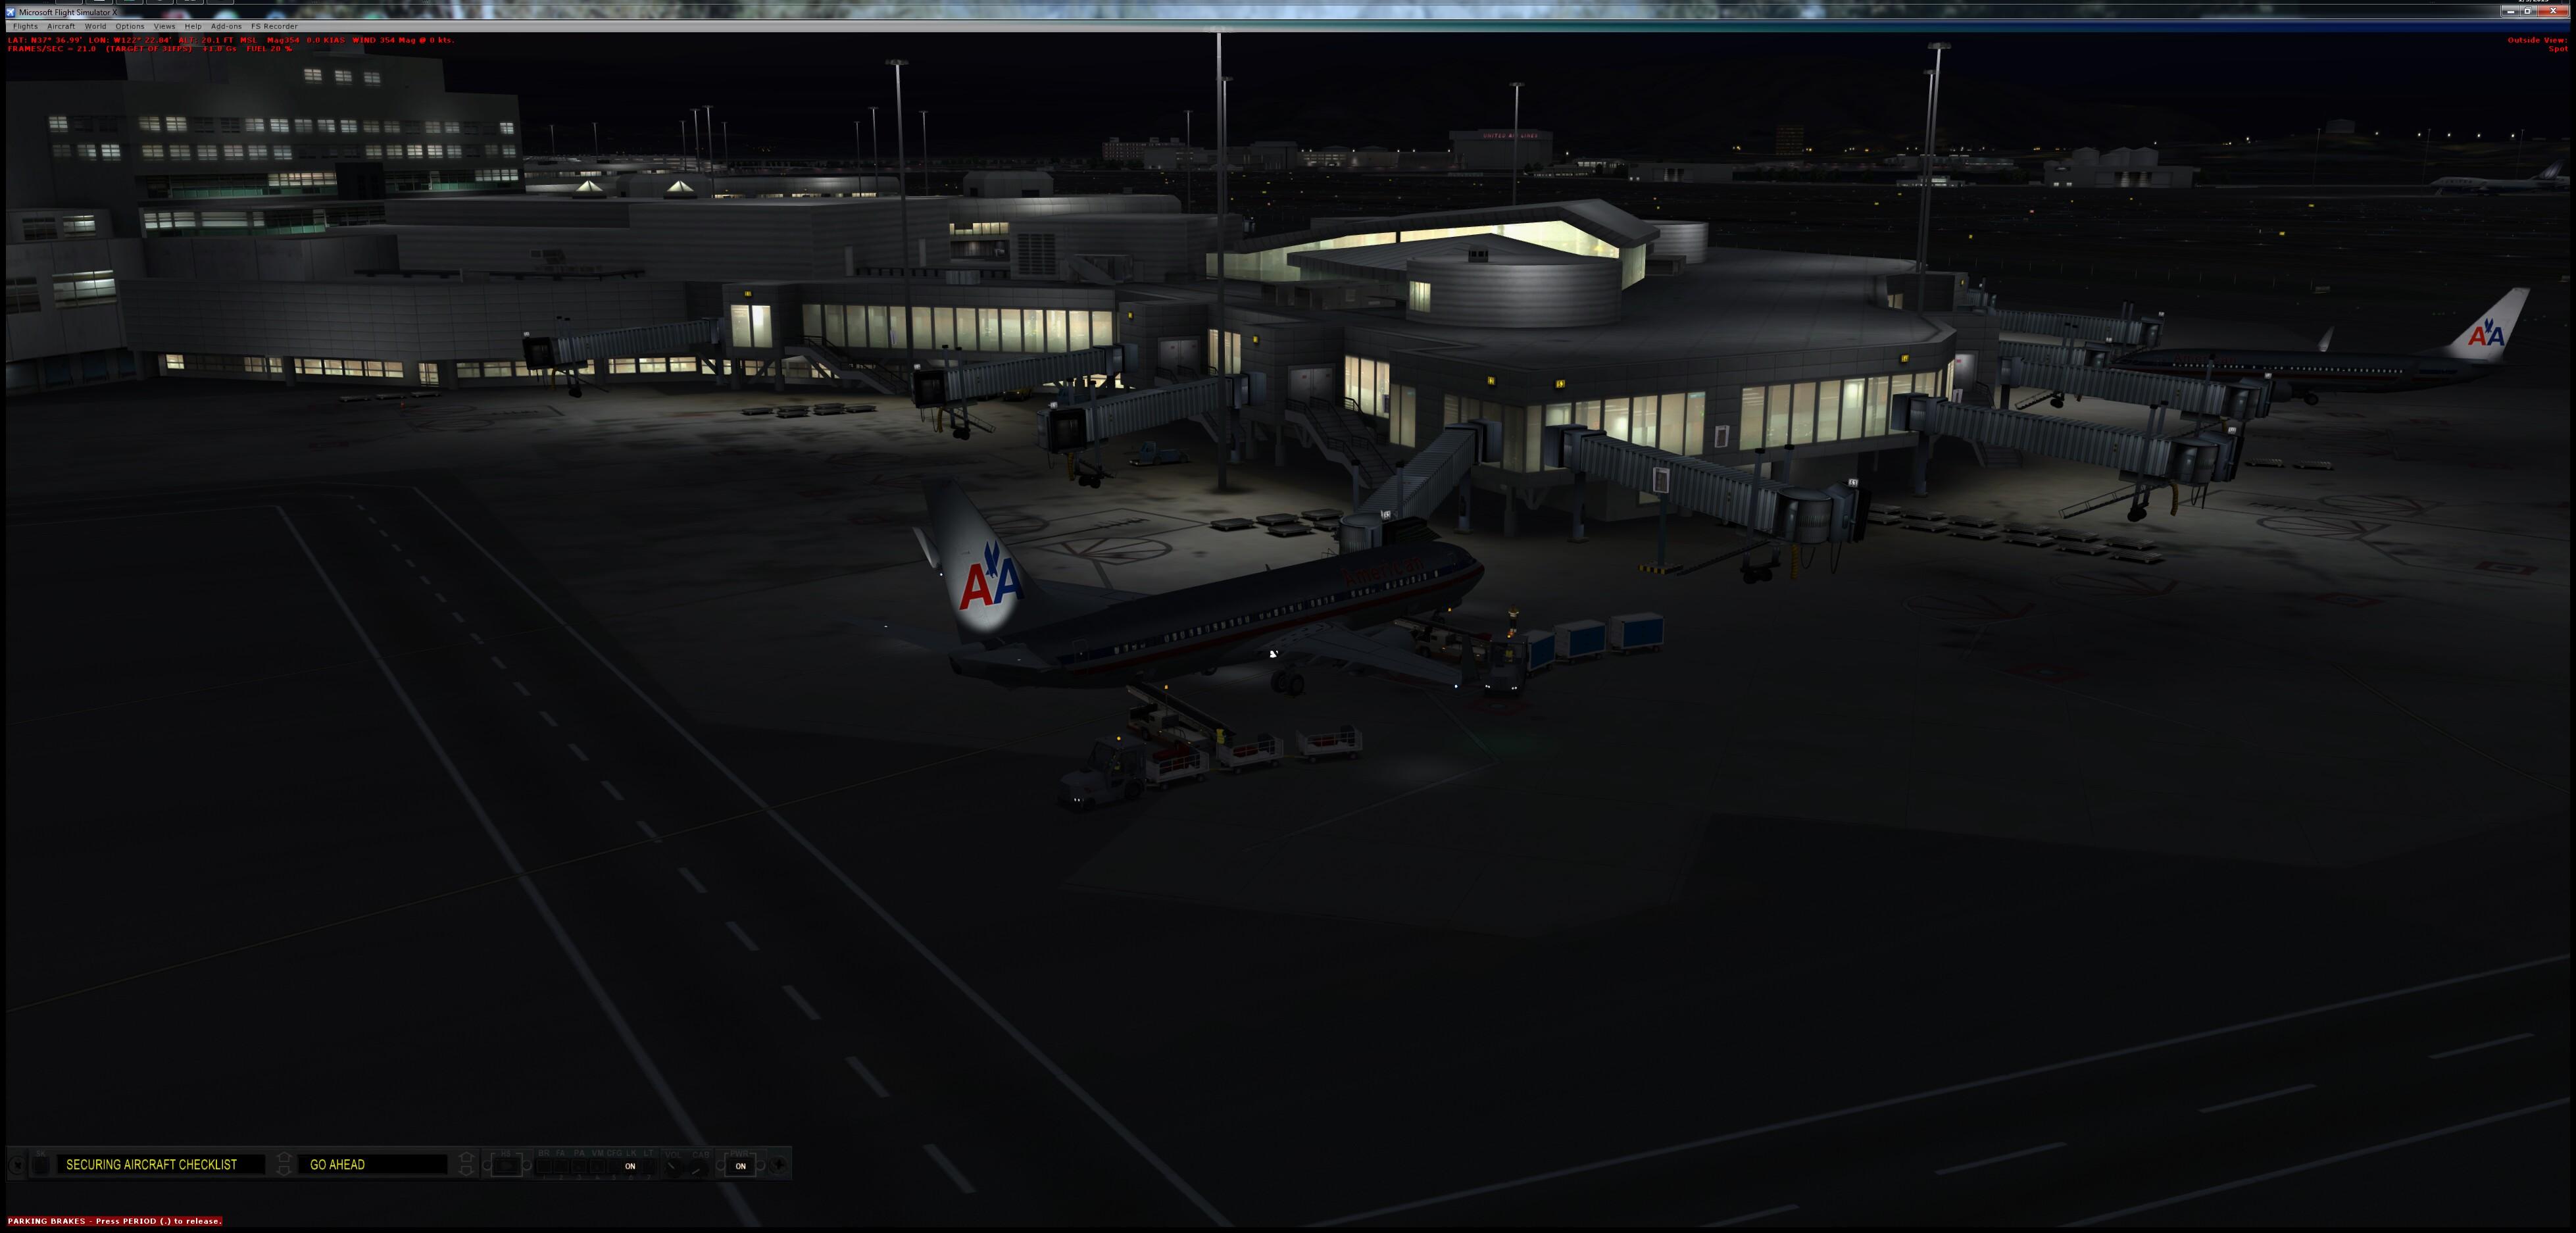 ScreenshotsKLAX-KSFO-25.jpg